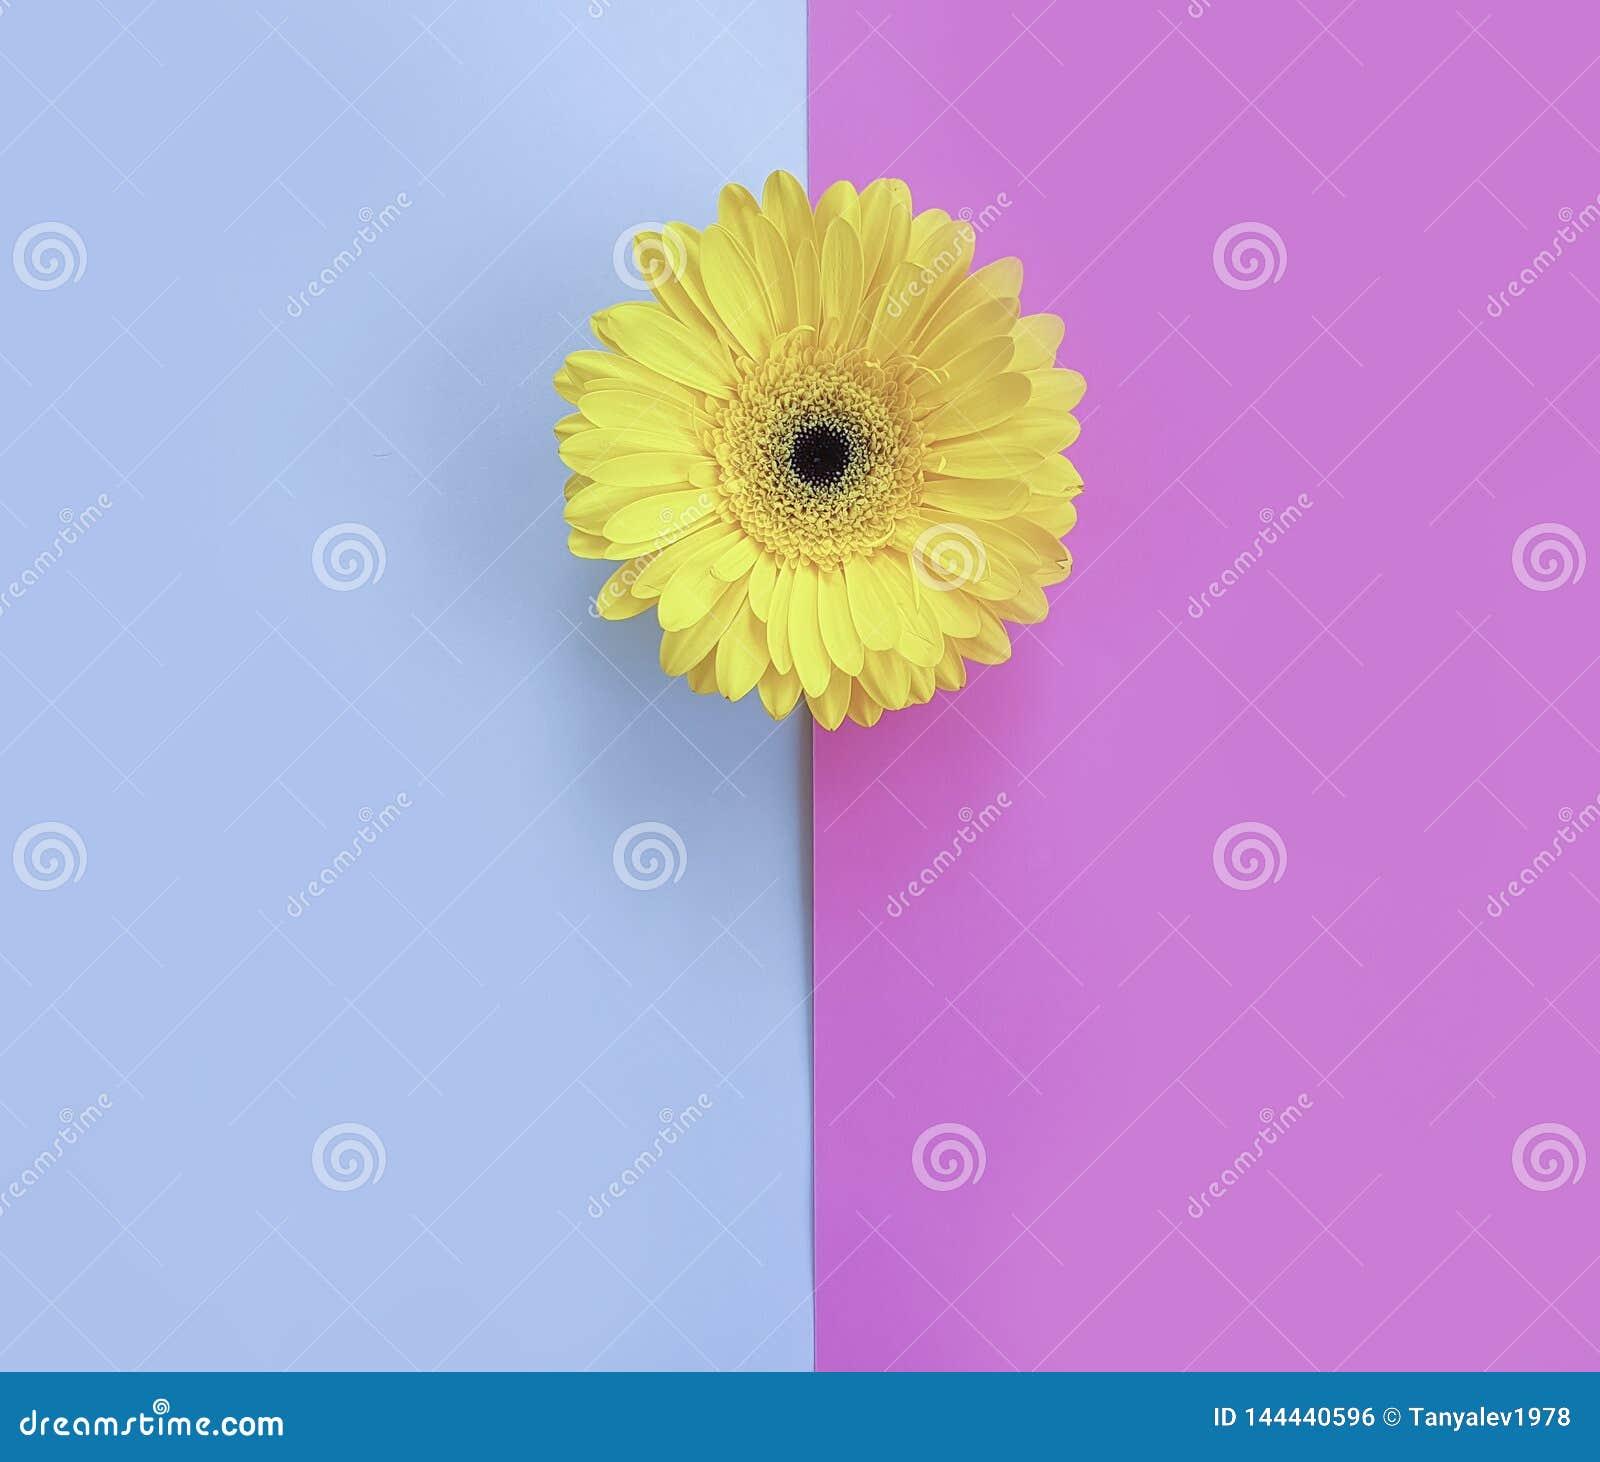 Flower gerbera on colorful season texture romantic spring background beautiful minimalism creative